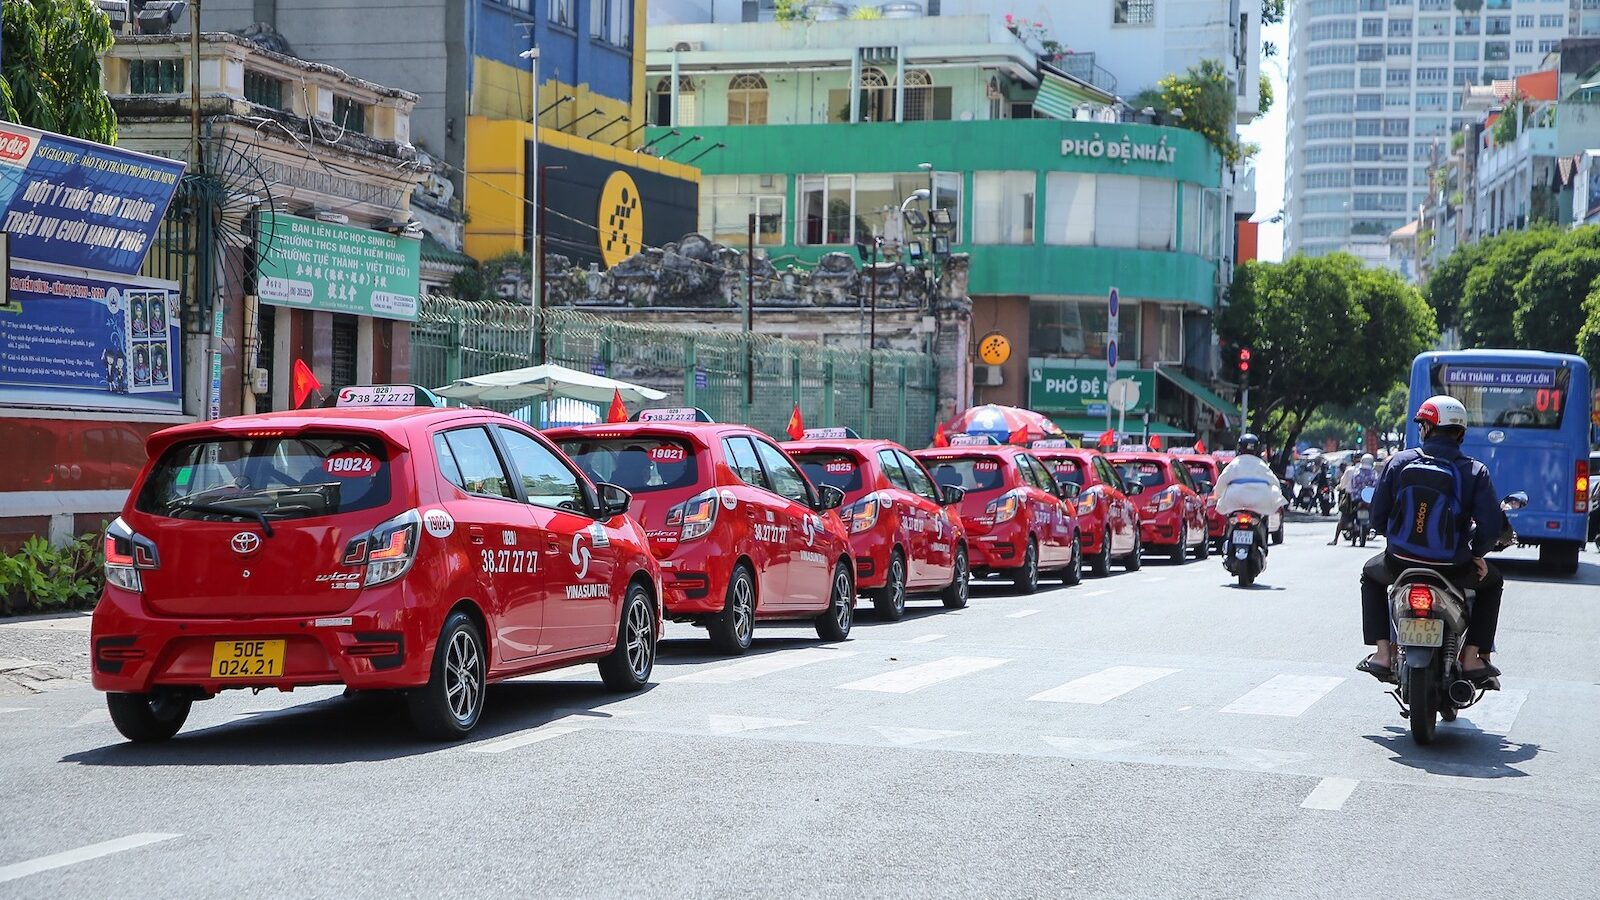 Image of a fleet of red Vinasun Taxis in Vietnam